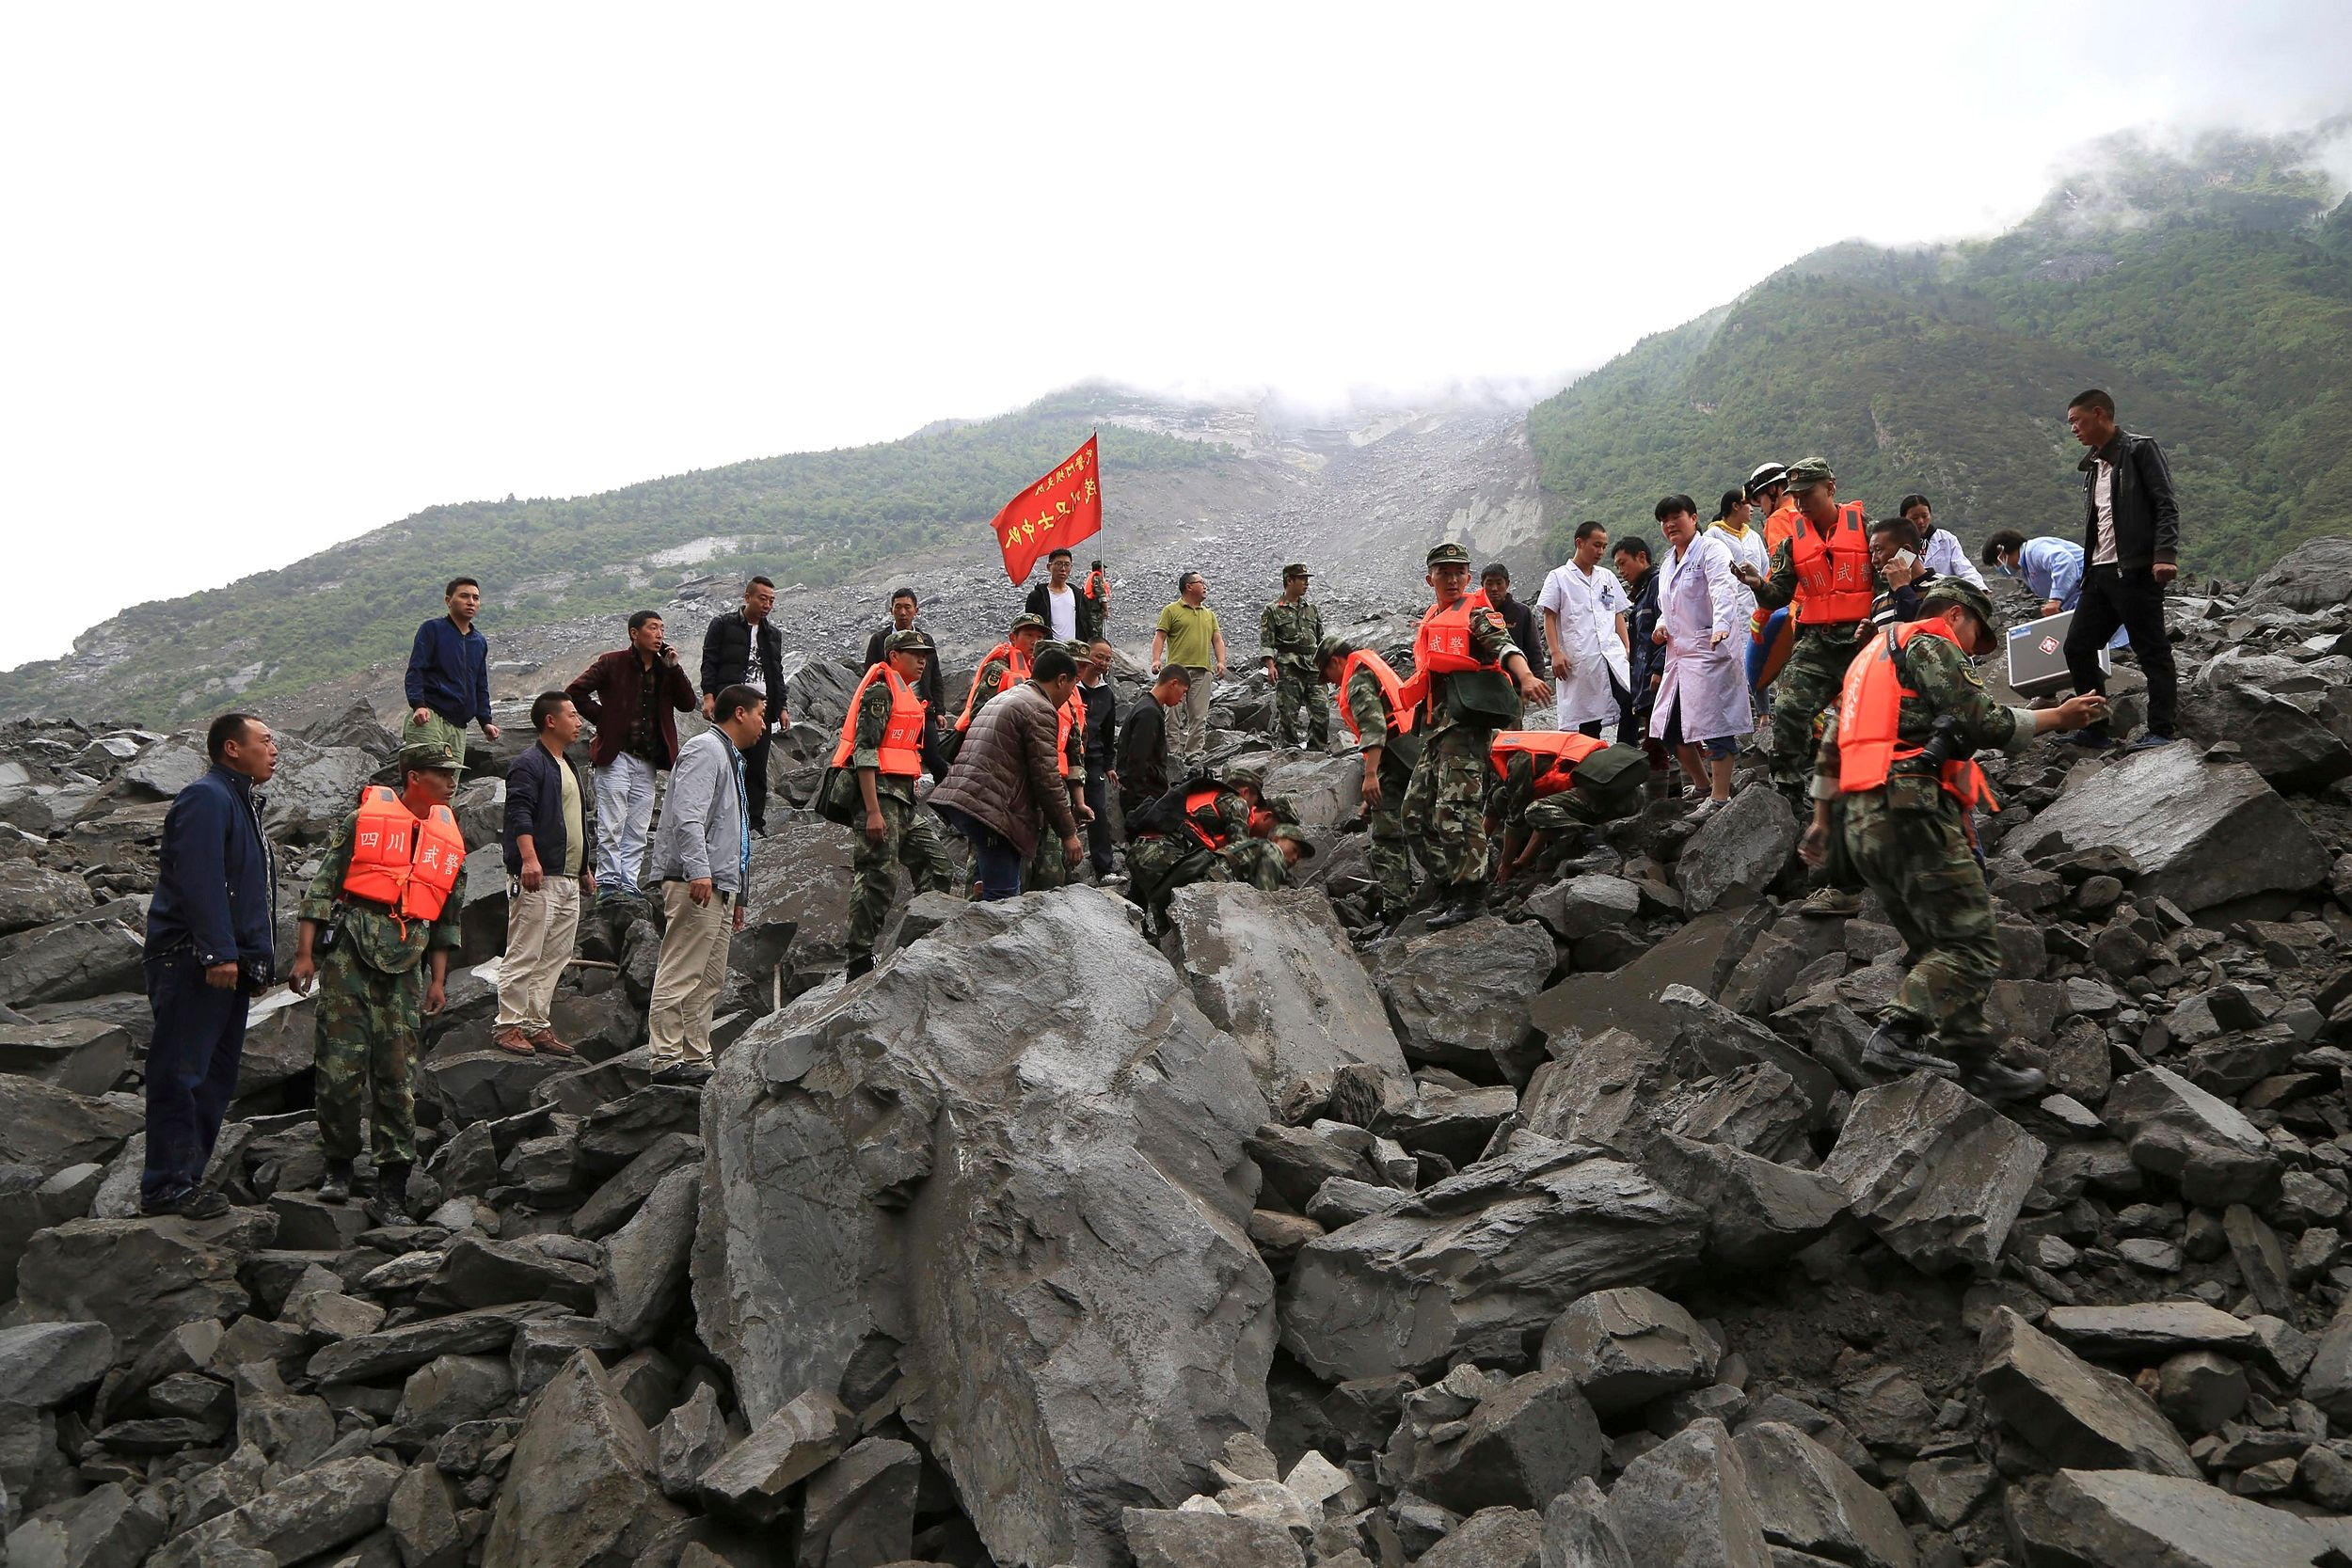 Fifteen dead, over 100 people missing in China landslide